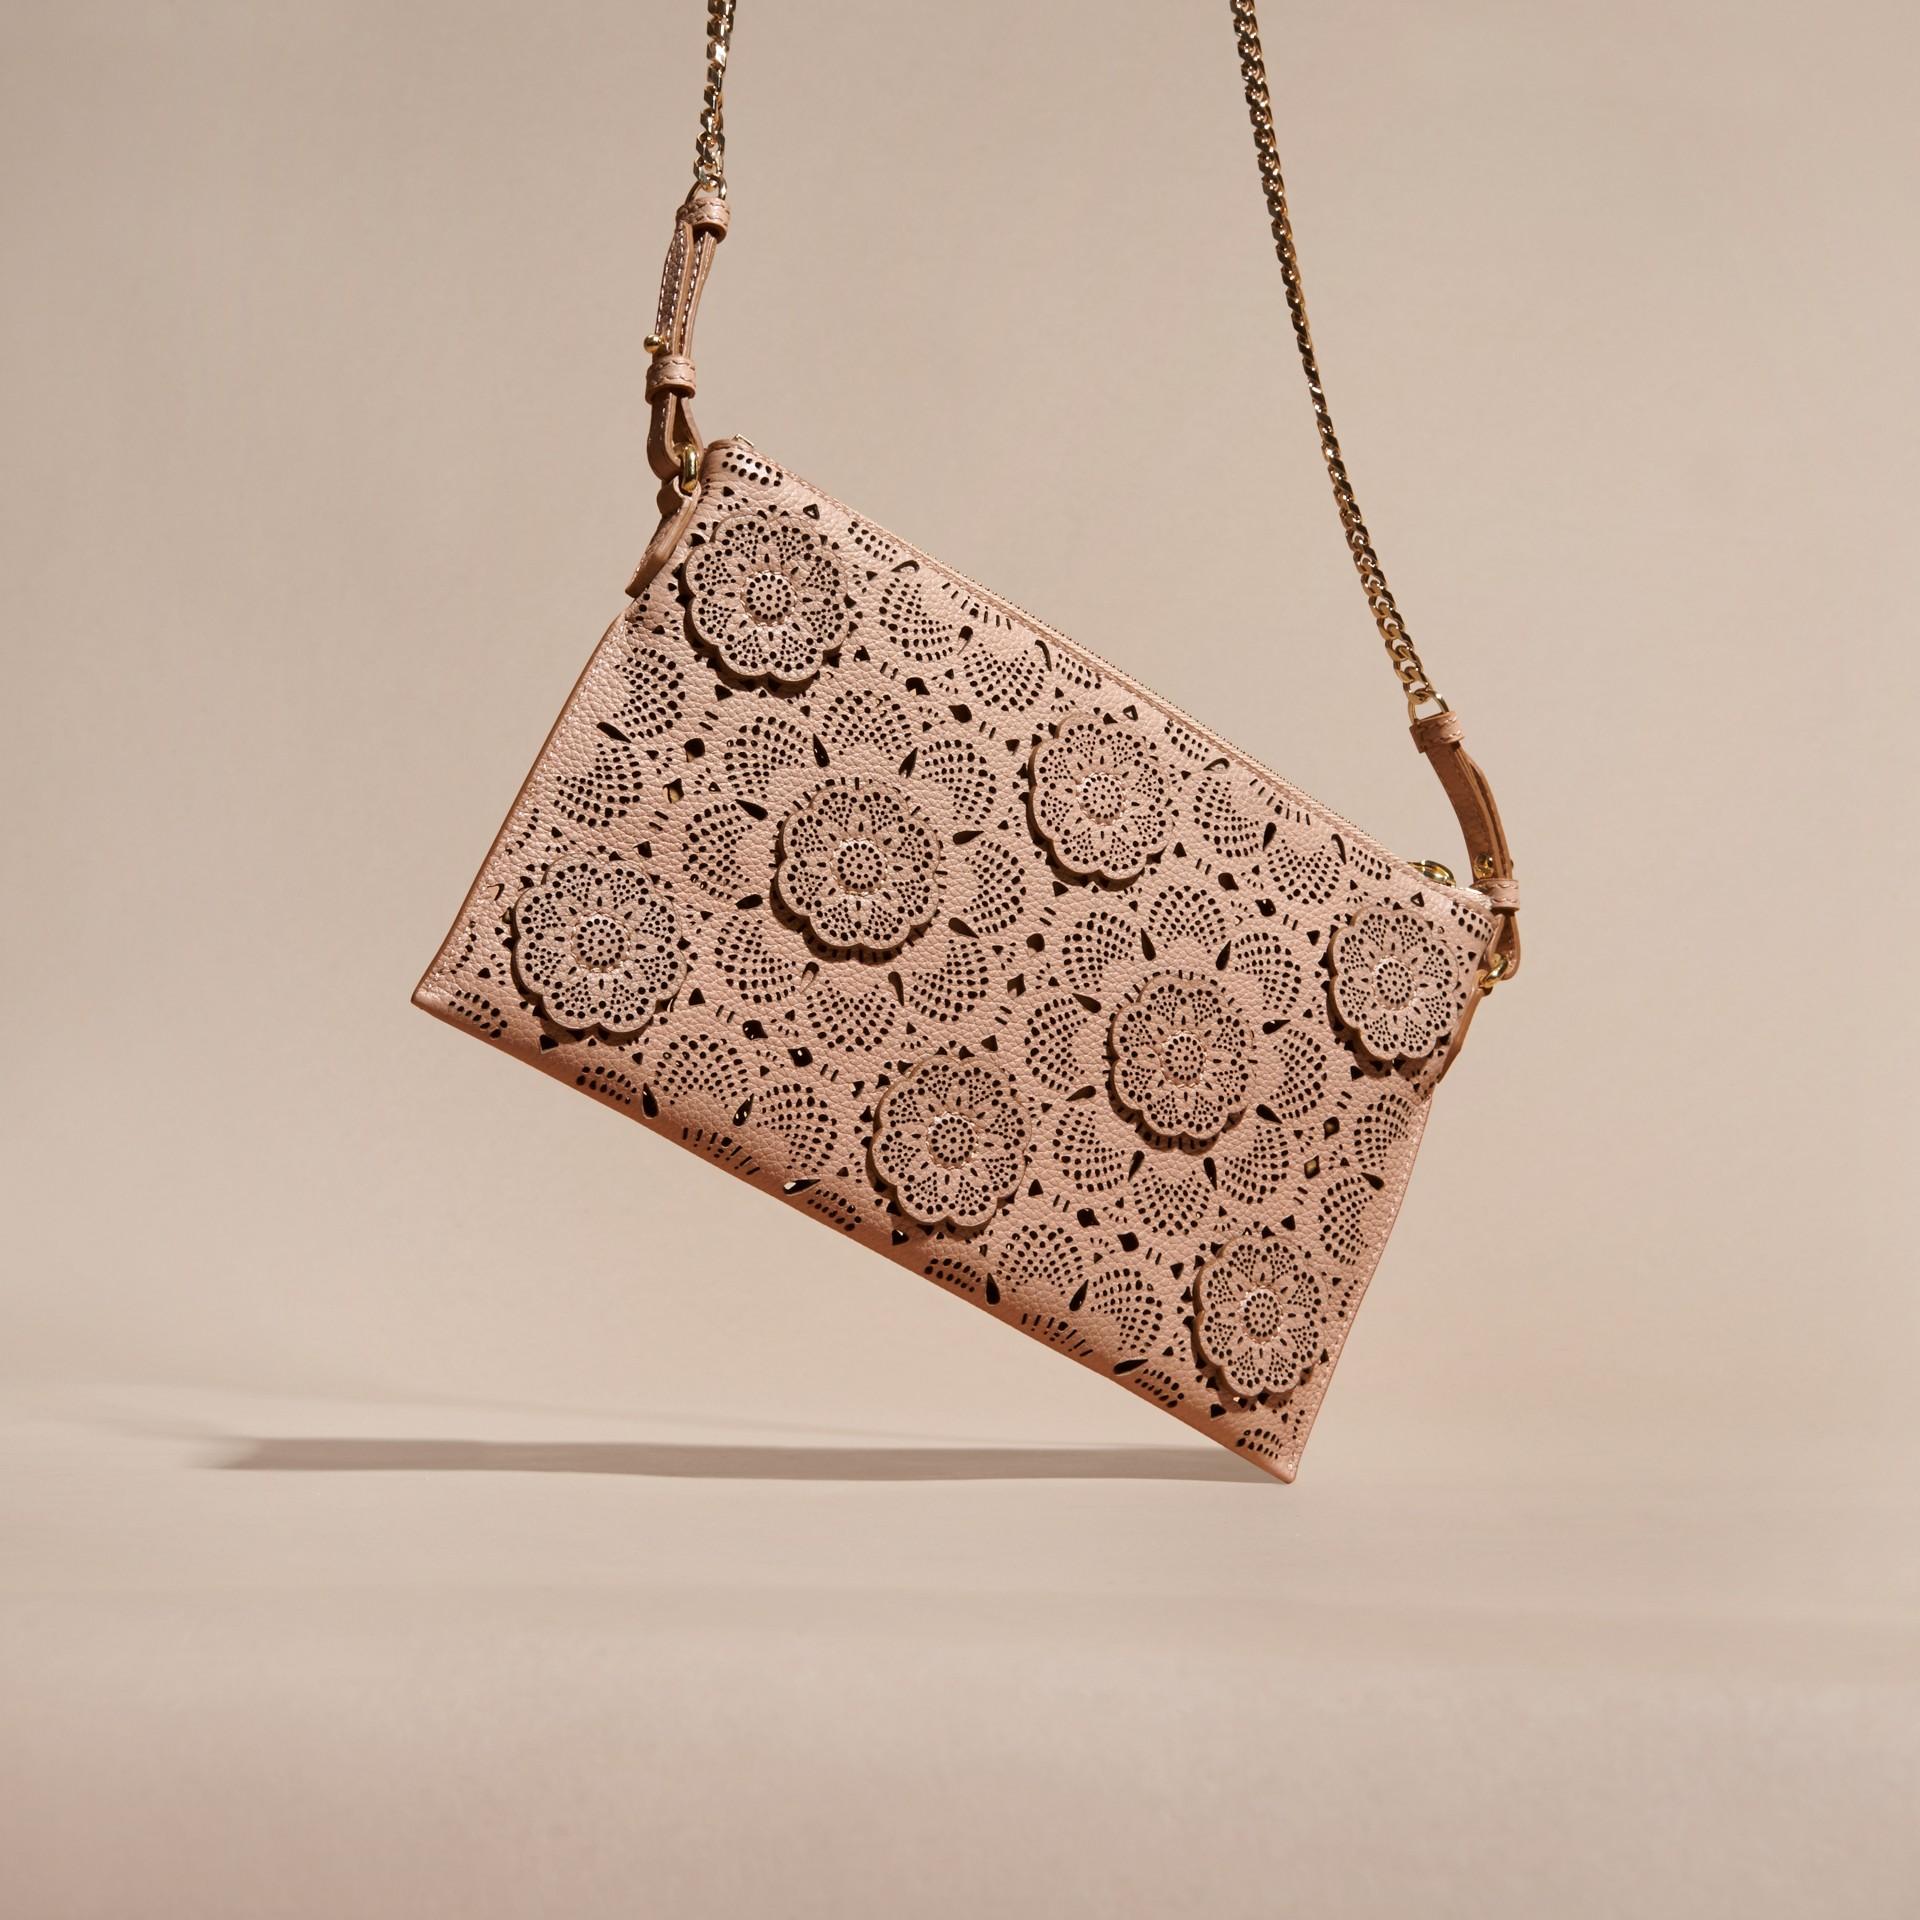 Pale apricot Laser-cut Floral Lace Leather Clutch Bag Pale Apricot - gallery image 4